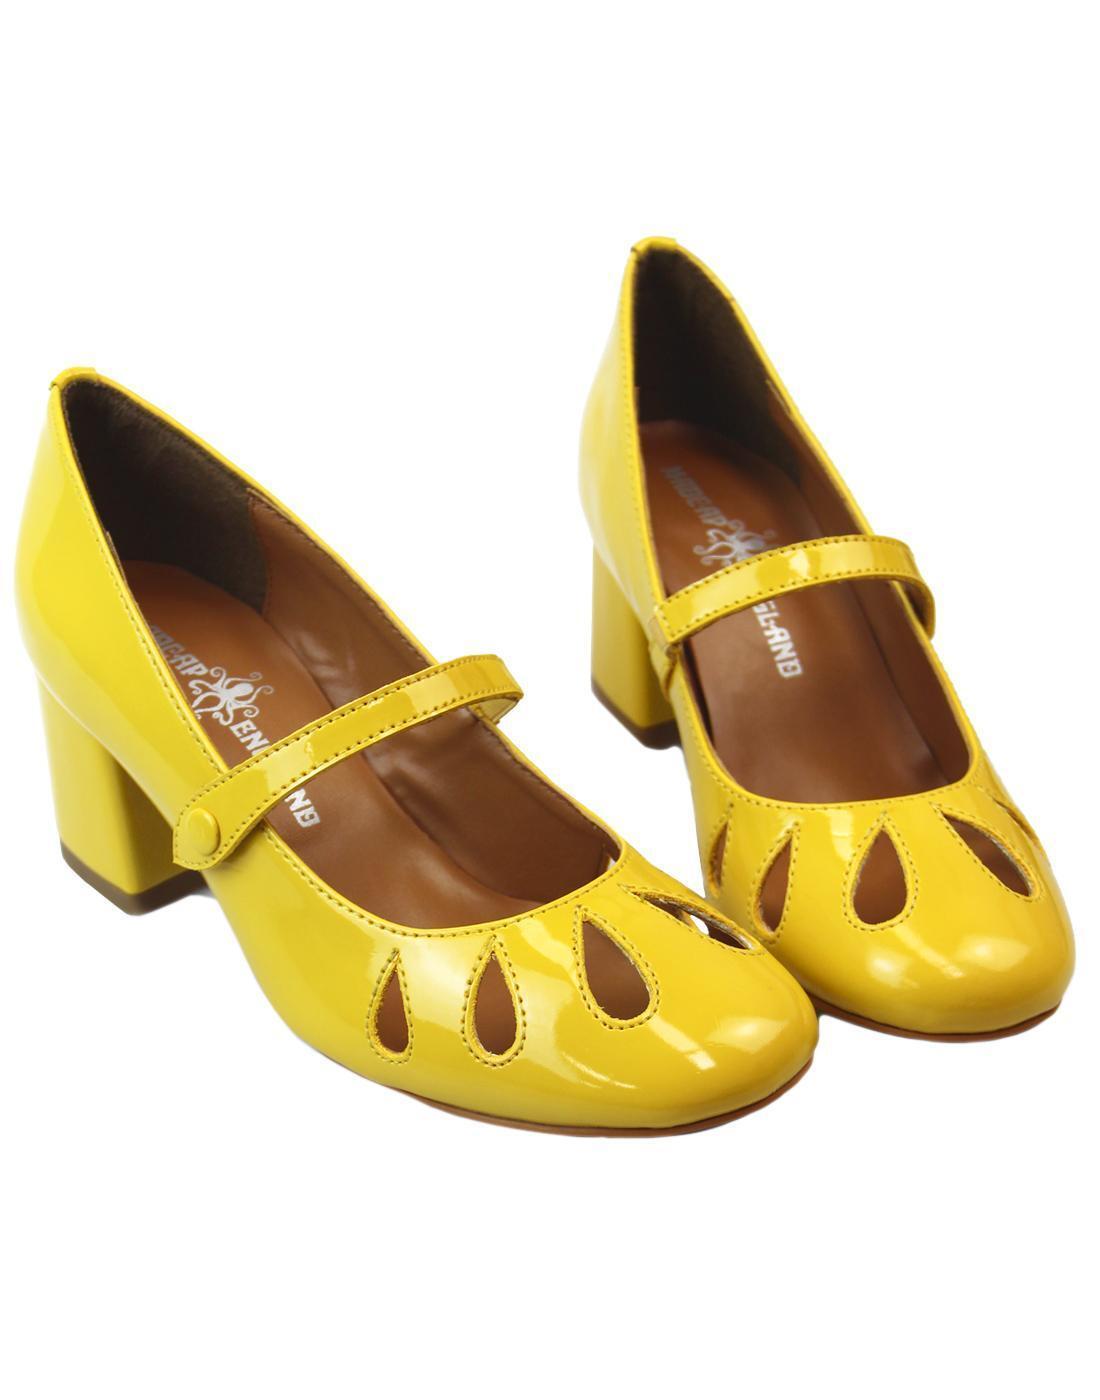 NEW  Damenschuhe RETRO 60s 60s RETRO Schuhe HEELS MOD Vintage Madcap England YELLOW MARY JANE c4aec5